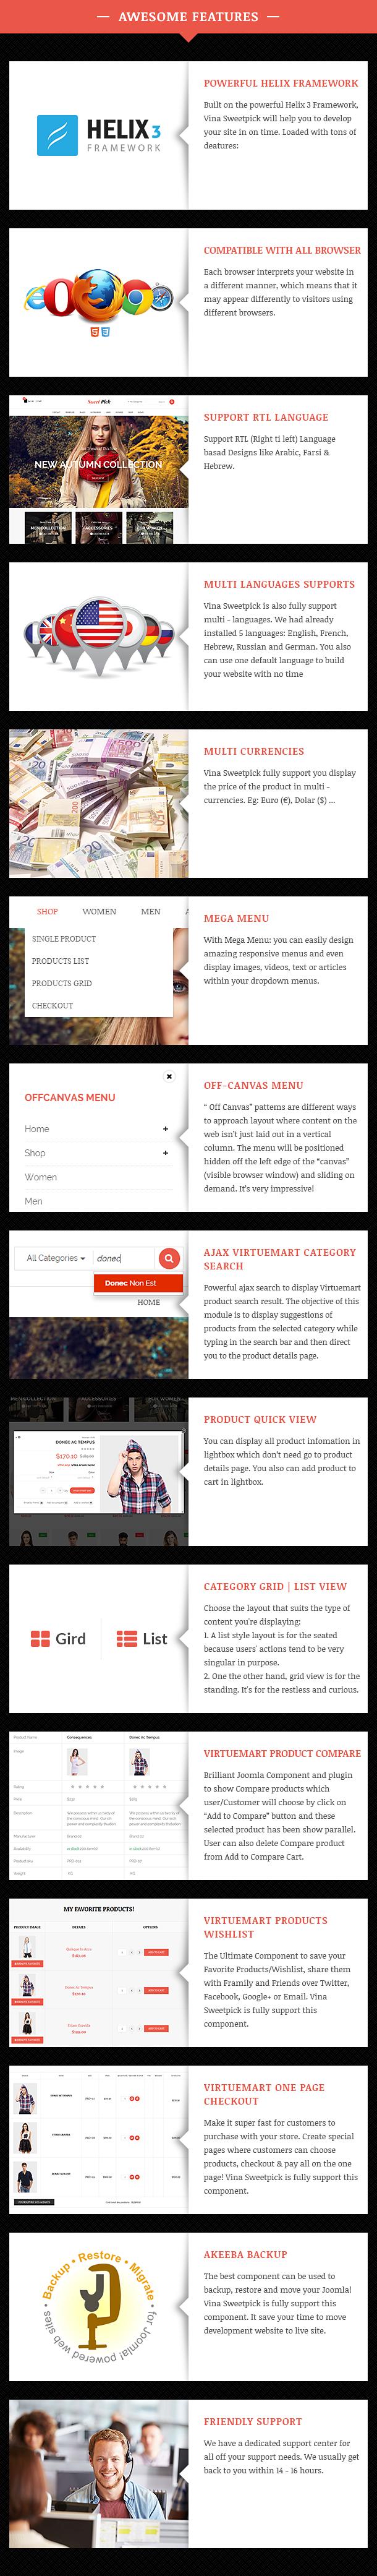 Vina SweetPick - Modern eCommerce VirtueMart Joomla Template - 16